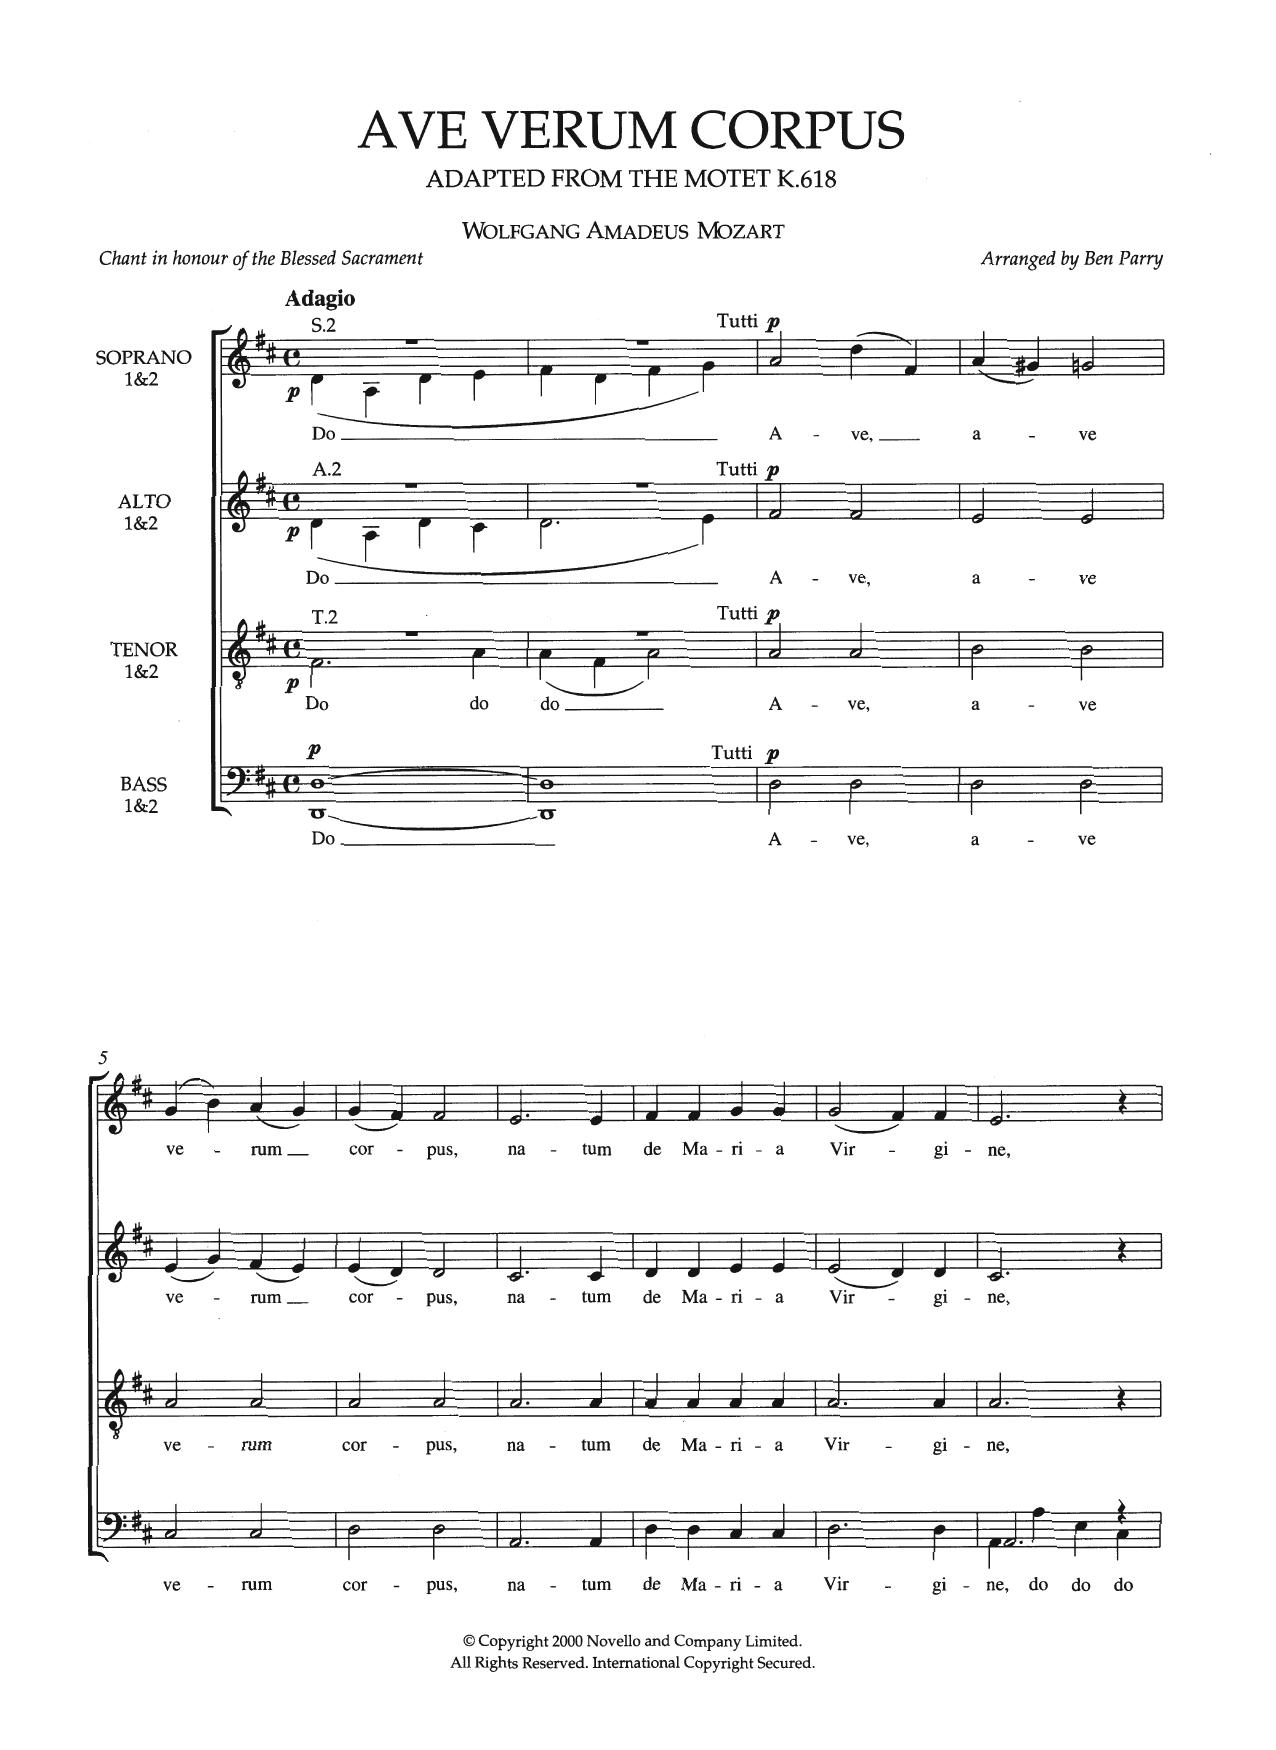 Wolfgang Amadeus Mozart - Ave Verum Corpus, K618 (arr. Ben Parry)